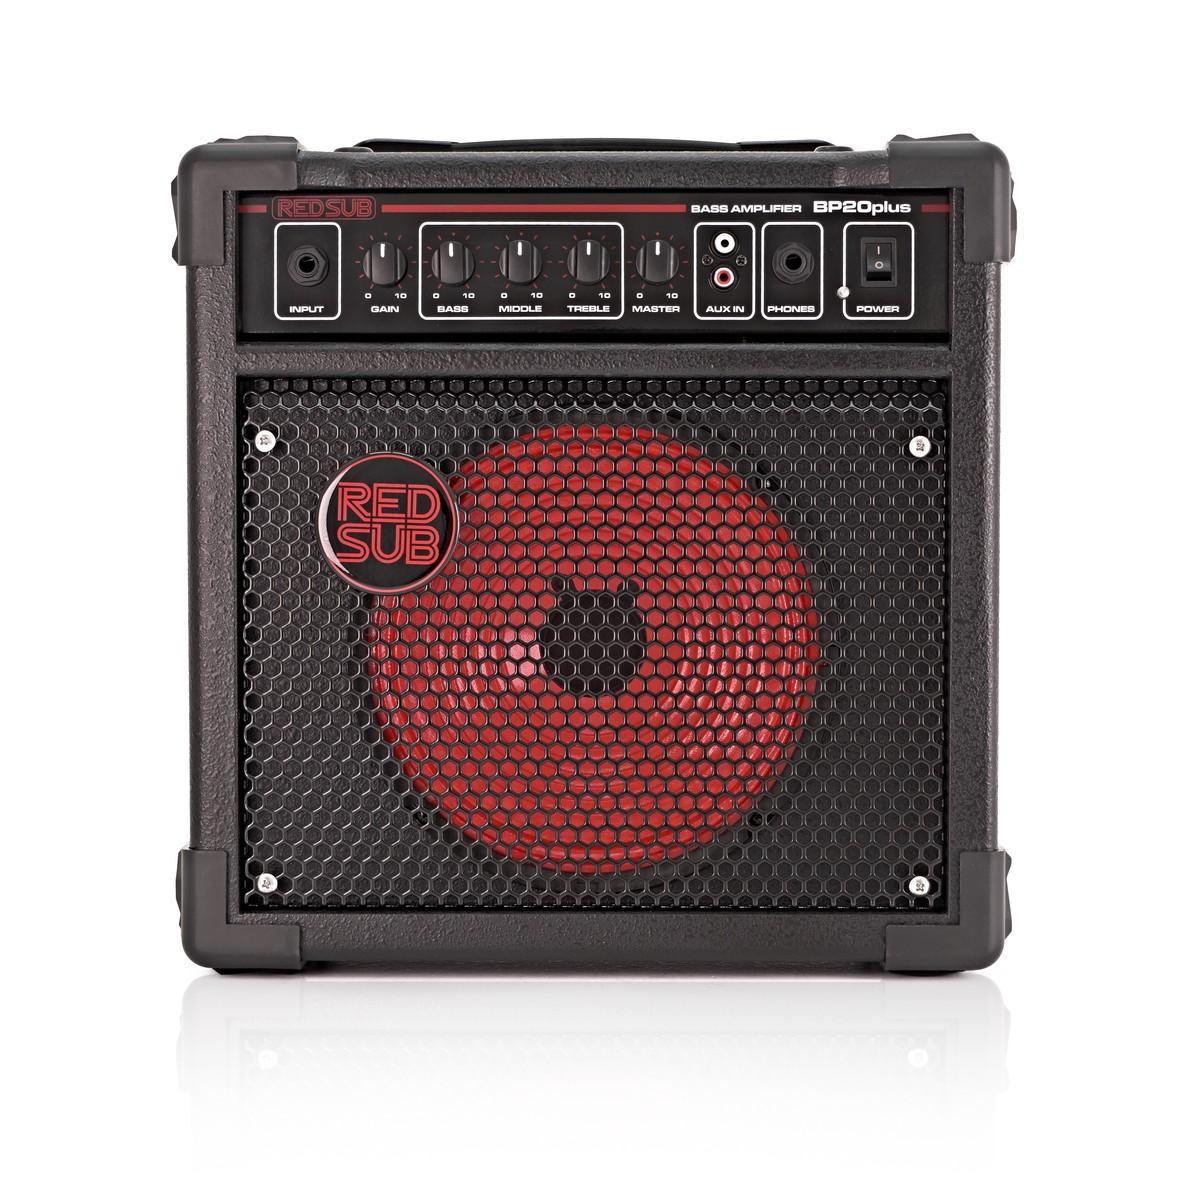 How To Make Bass Guitar Amplifier : redsub bp20plus 20w bass guitar amplifier b stock at gear4music ~ Vivirlamusica.com Haus und Dekorationen